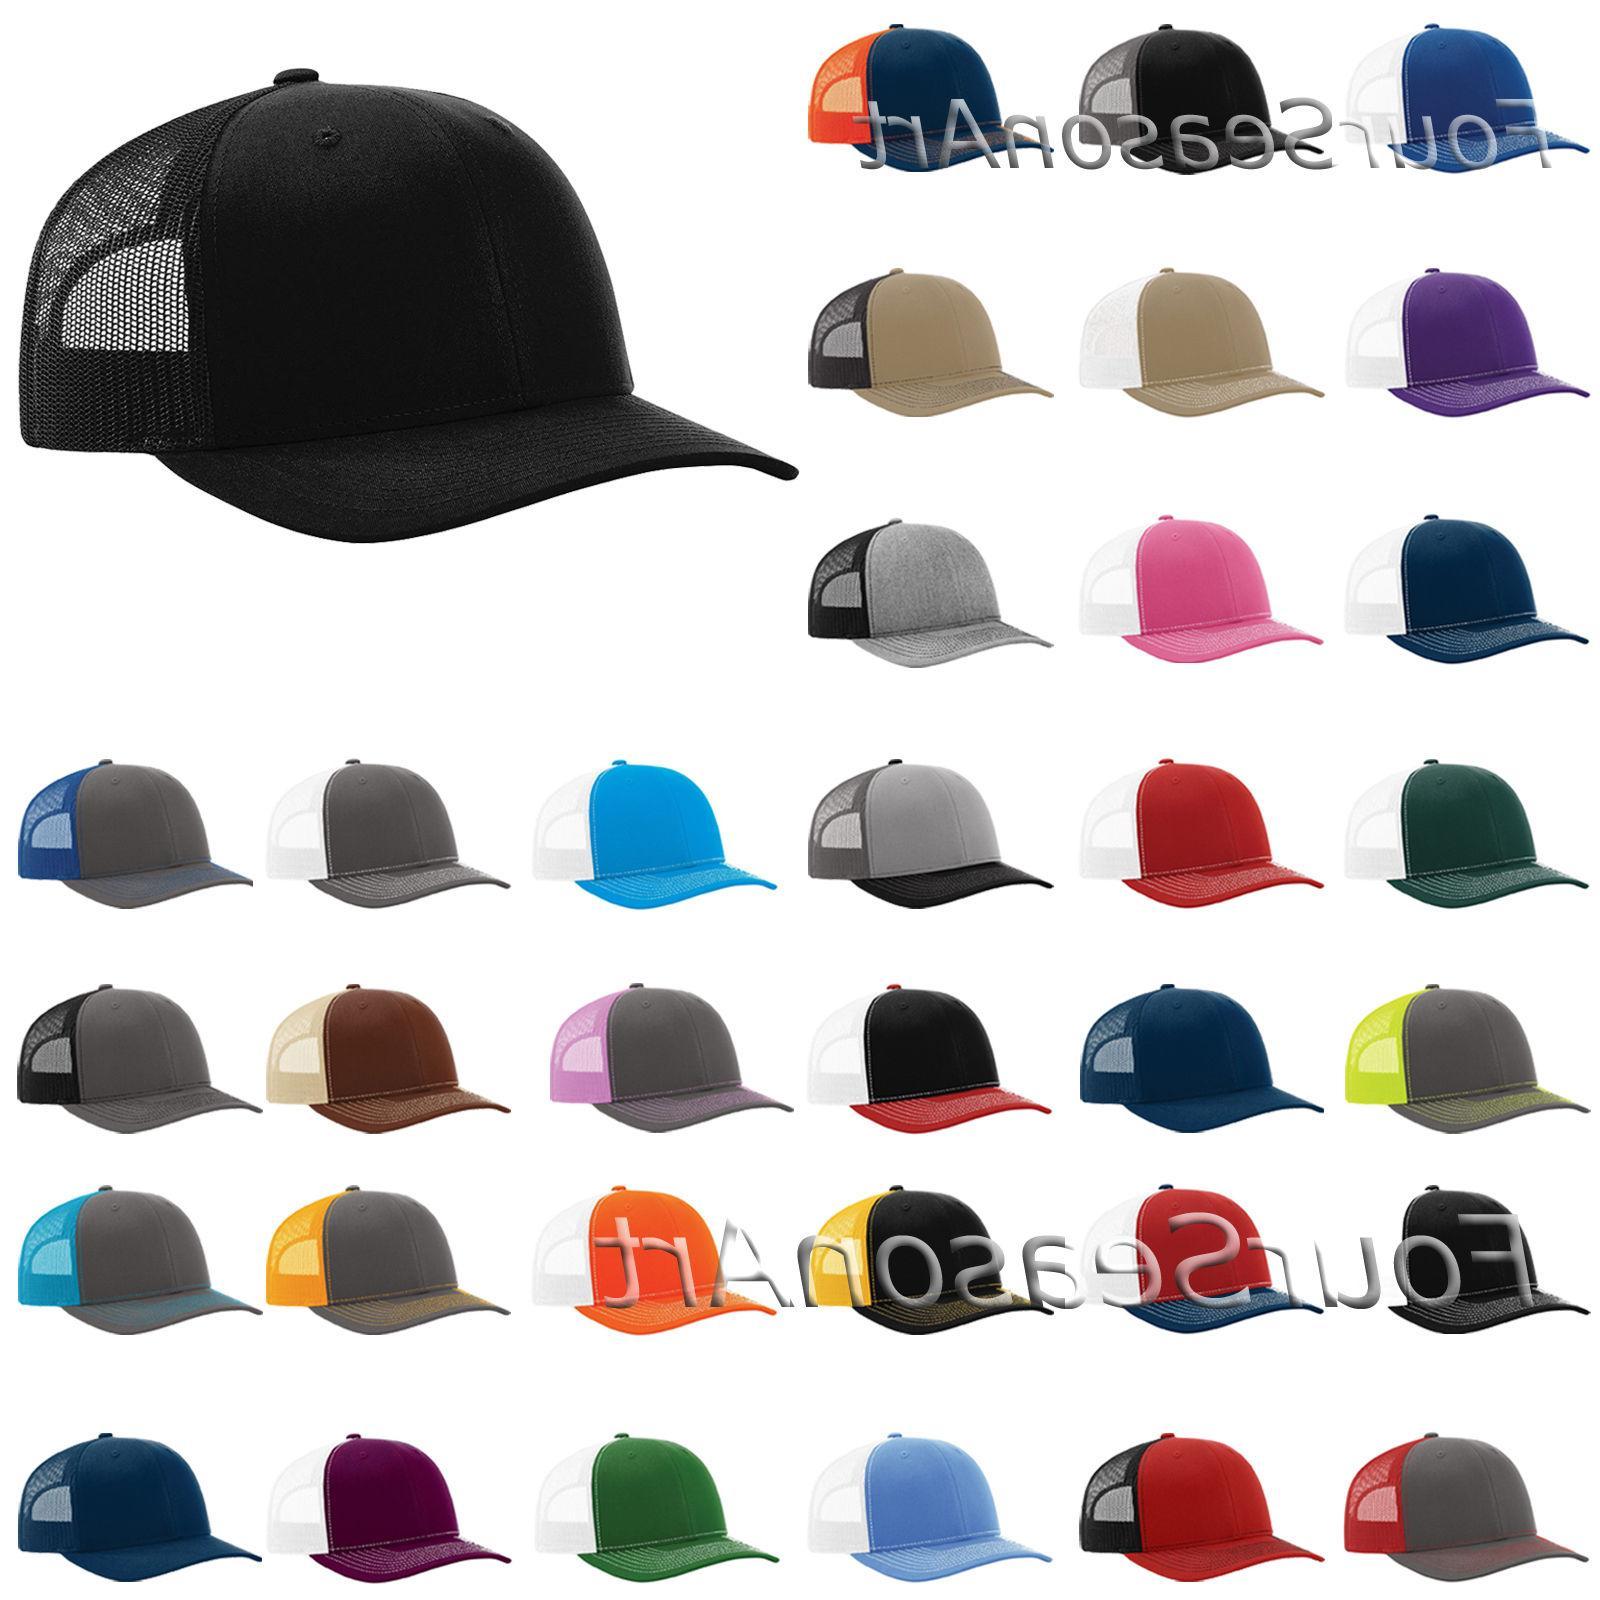 Richardson Trucker Ball Cap Meshback Hat Snapback Cap-112